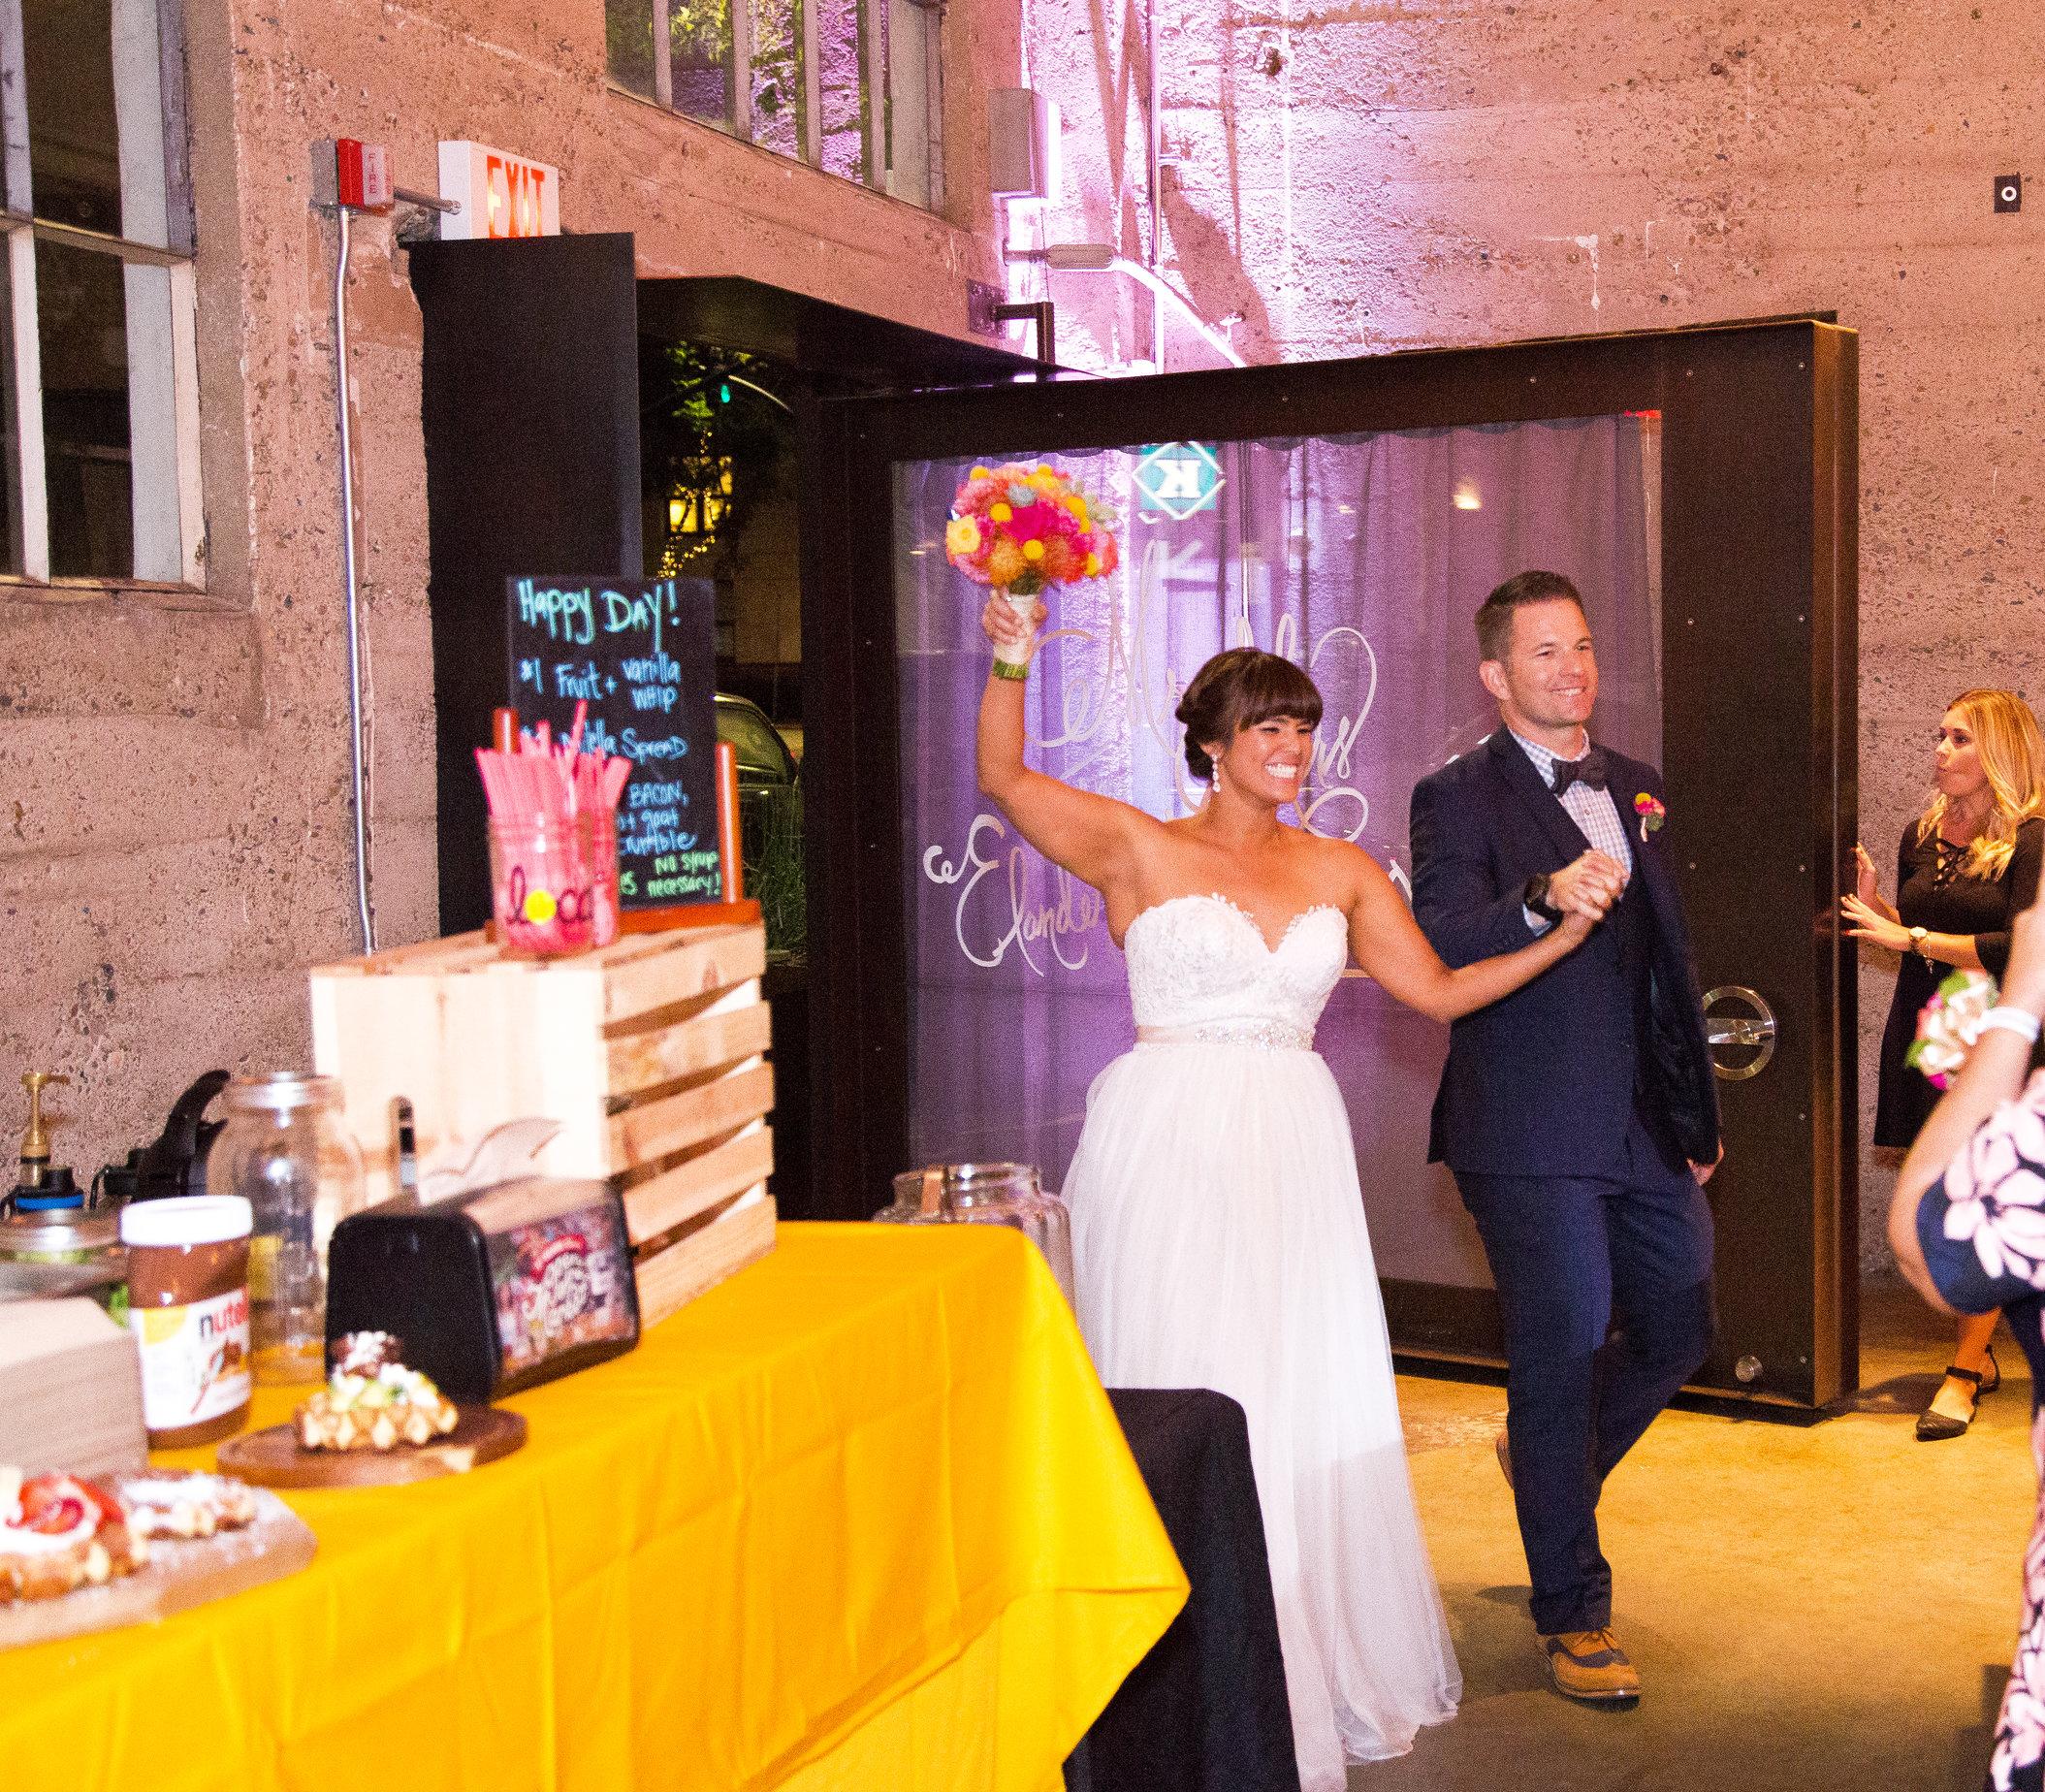 Erik and Melanie enter their wedding at Luce Loft in downtown San Diego.